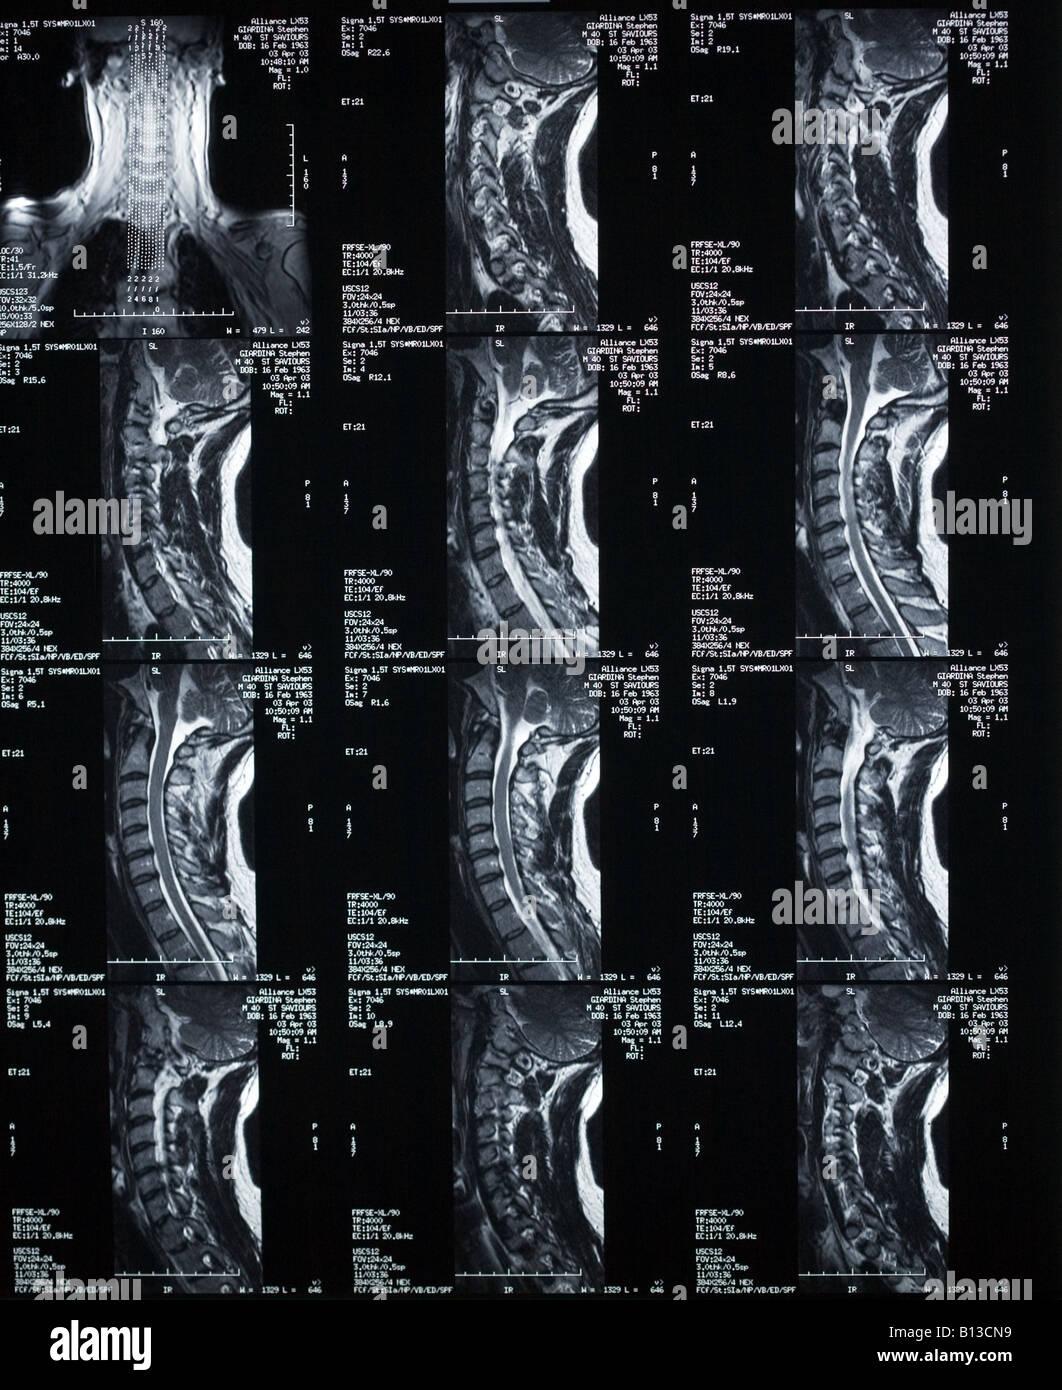 C Spine Stockfotos & C Spine Bilder - Alamy